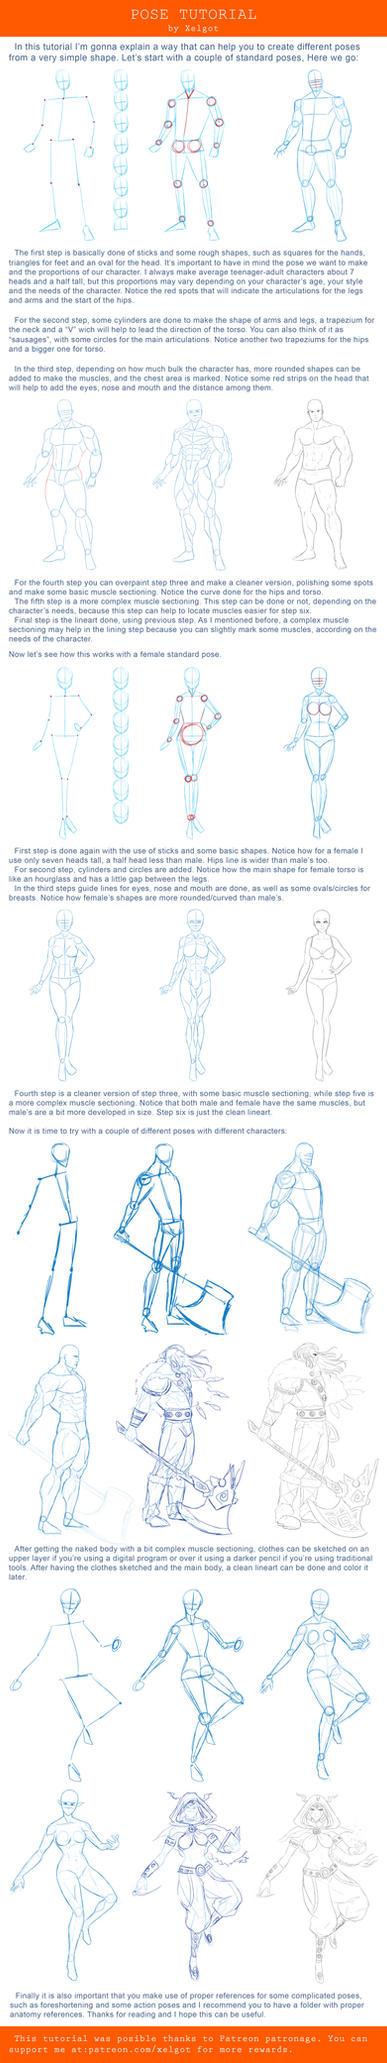 Pose tutorial by Xelgot